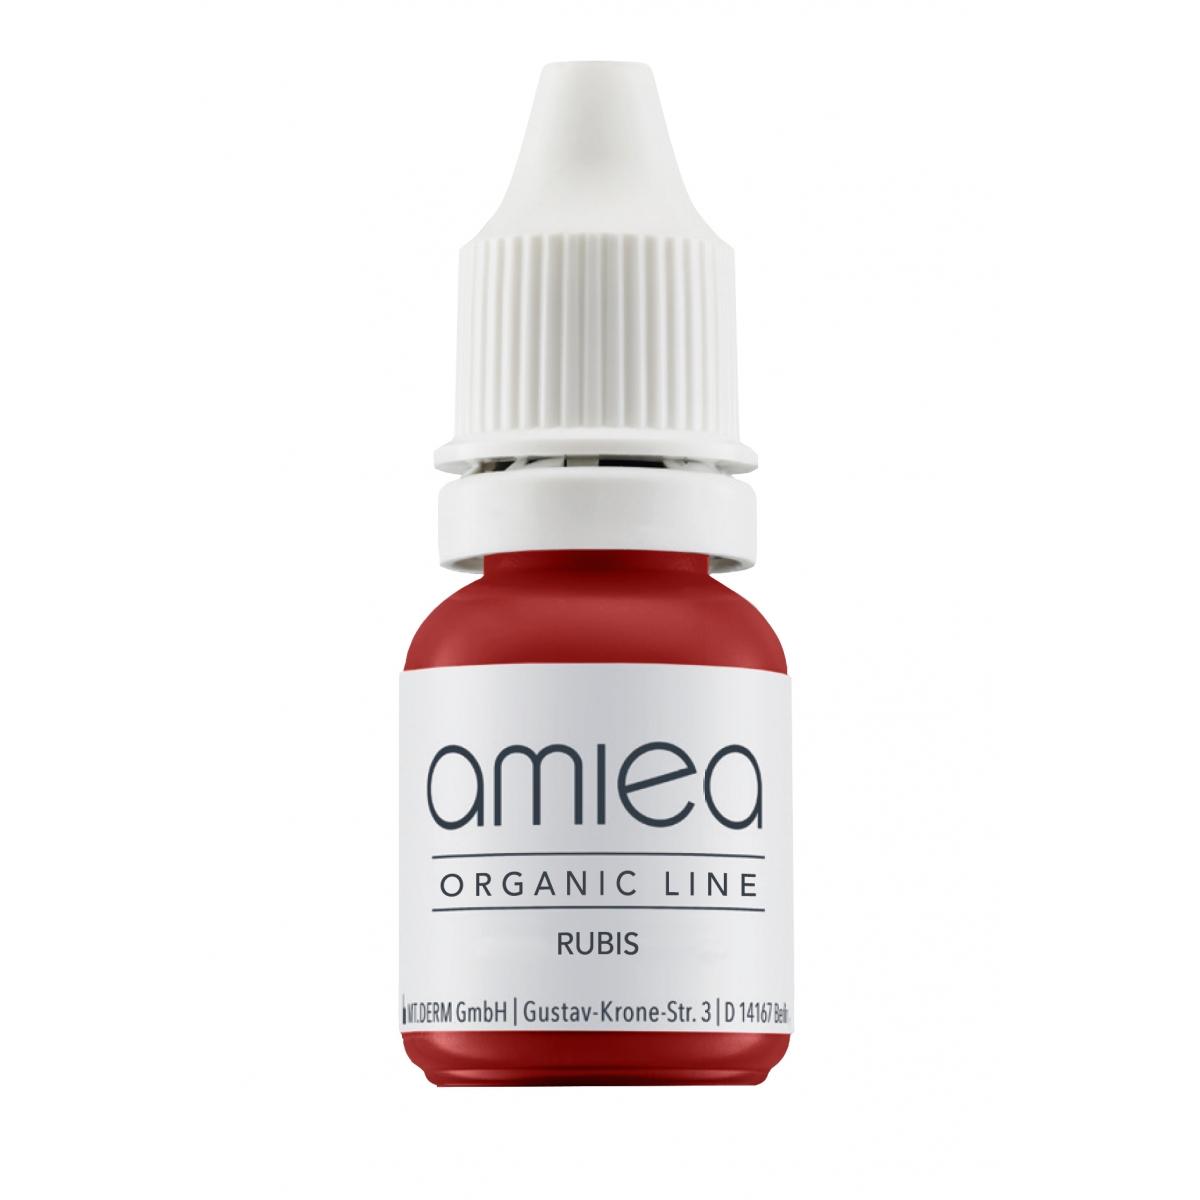 ORGANIC LINE (10ml) - PIGMENT RUBIS ORGANICLINE AMIEA (10 ml)